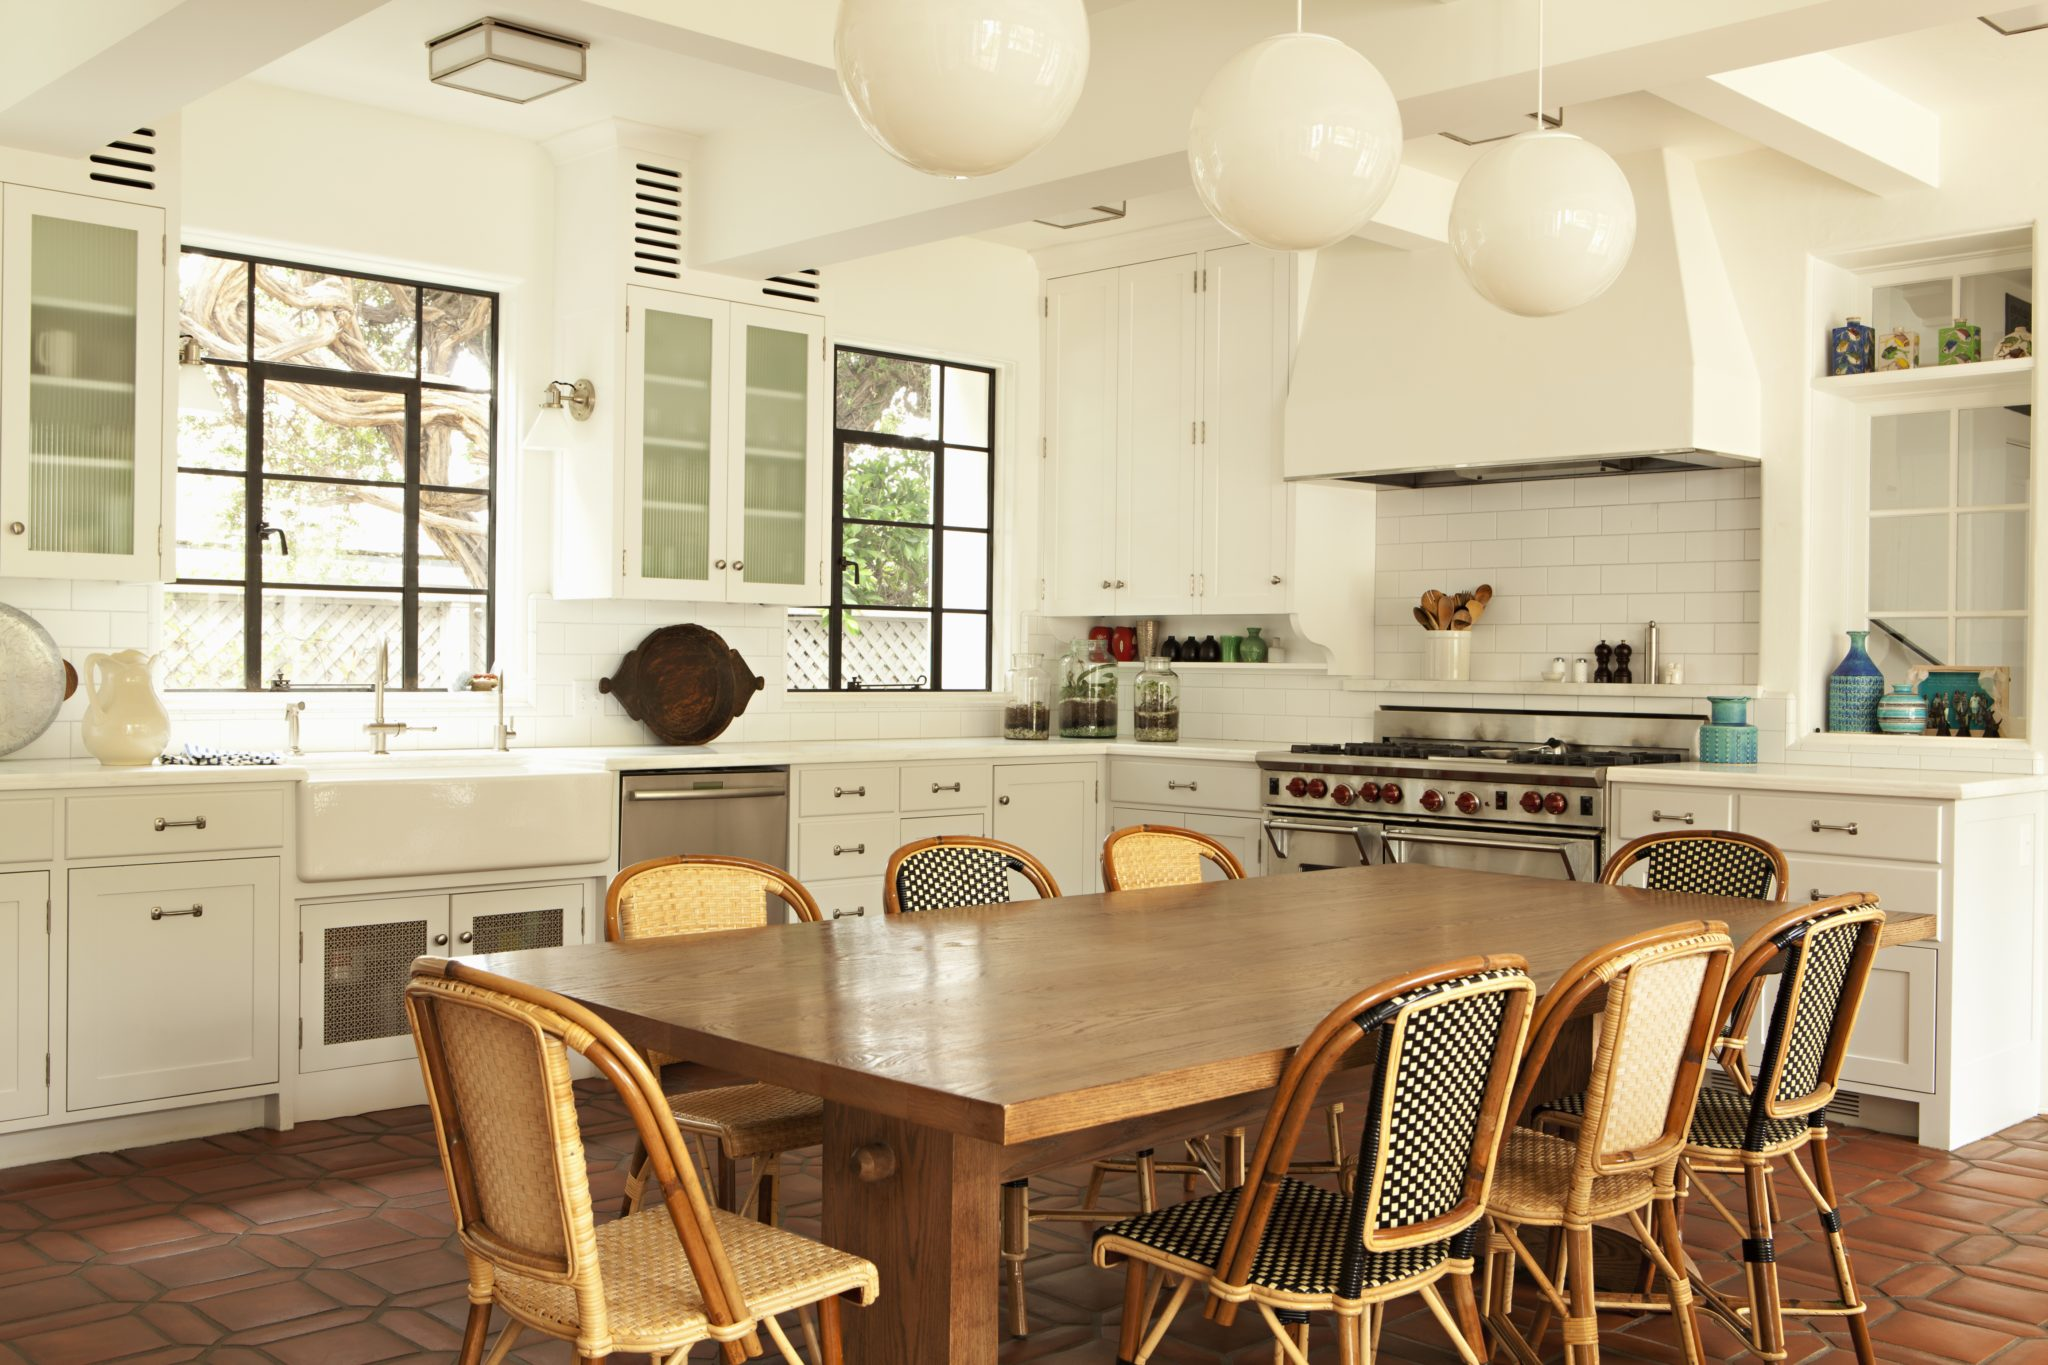 Charming kitchen by Tim Barber Ltd.